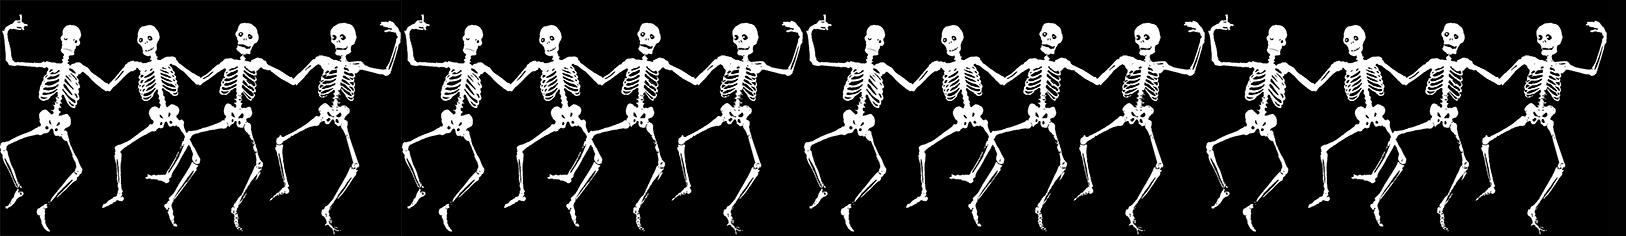 Halloween border with dancing skeletons